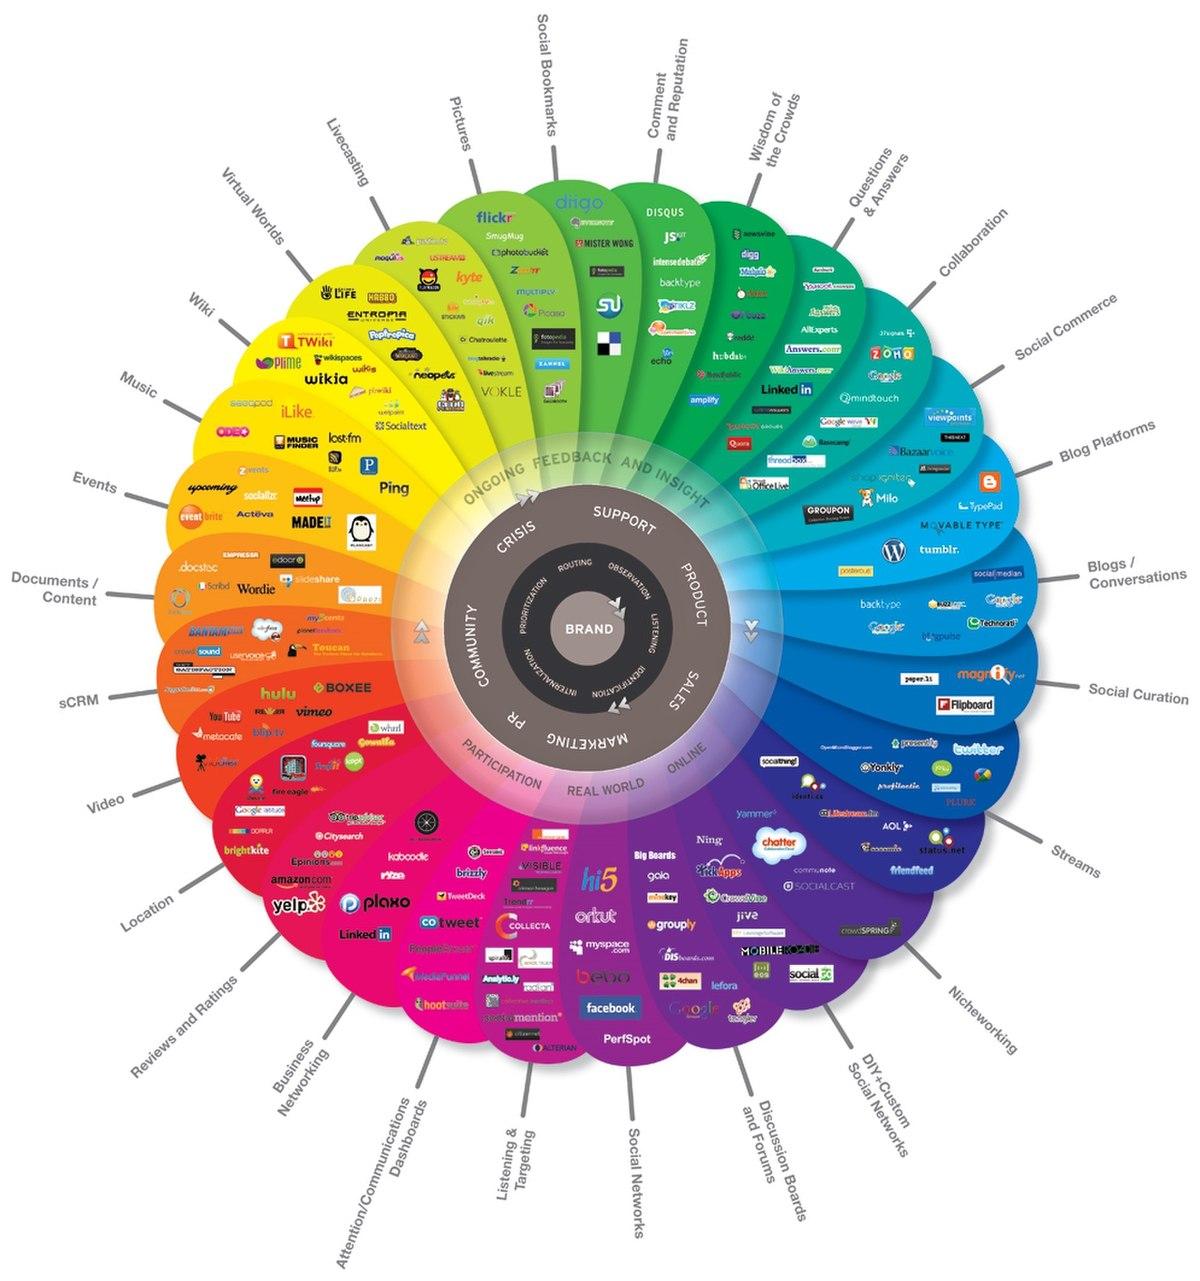 Conversationprism.jpeg σύνδεση ιστοσελίδας